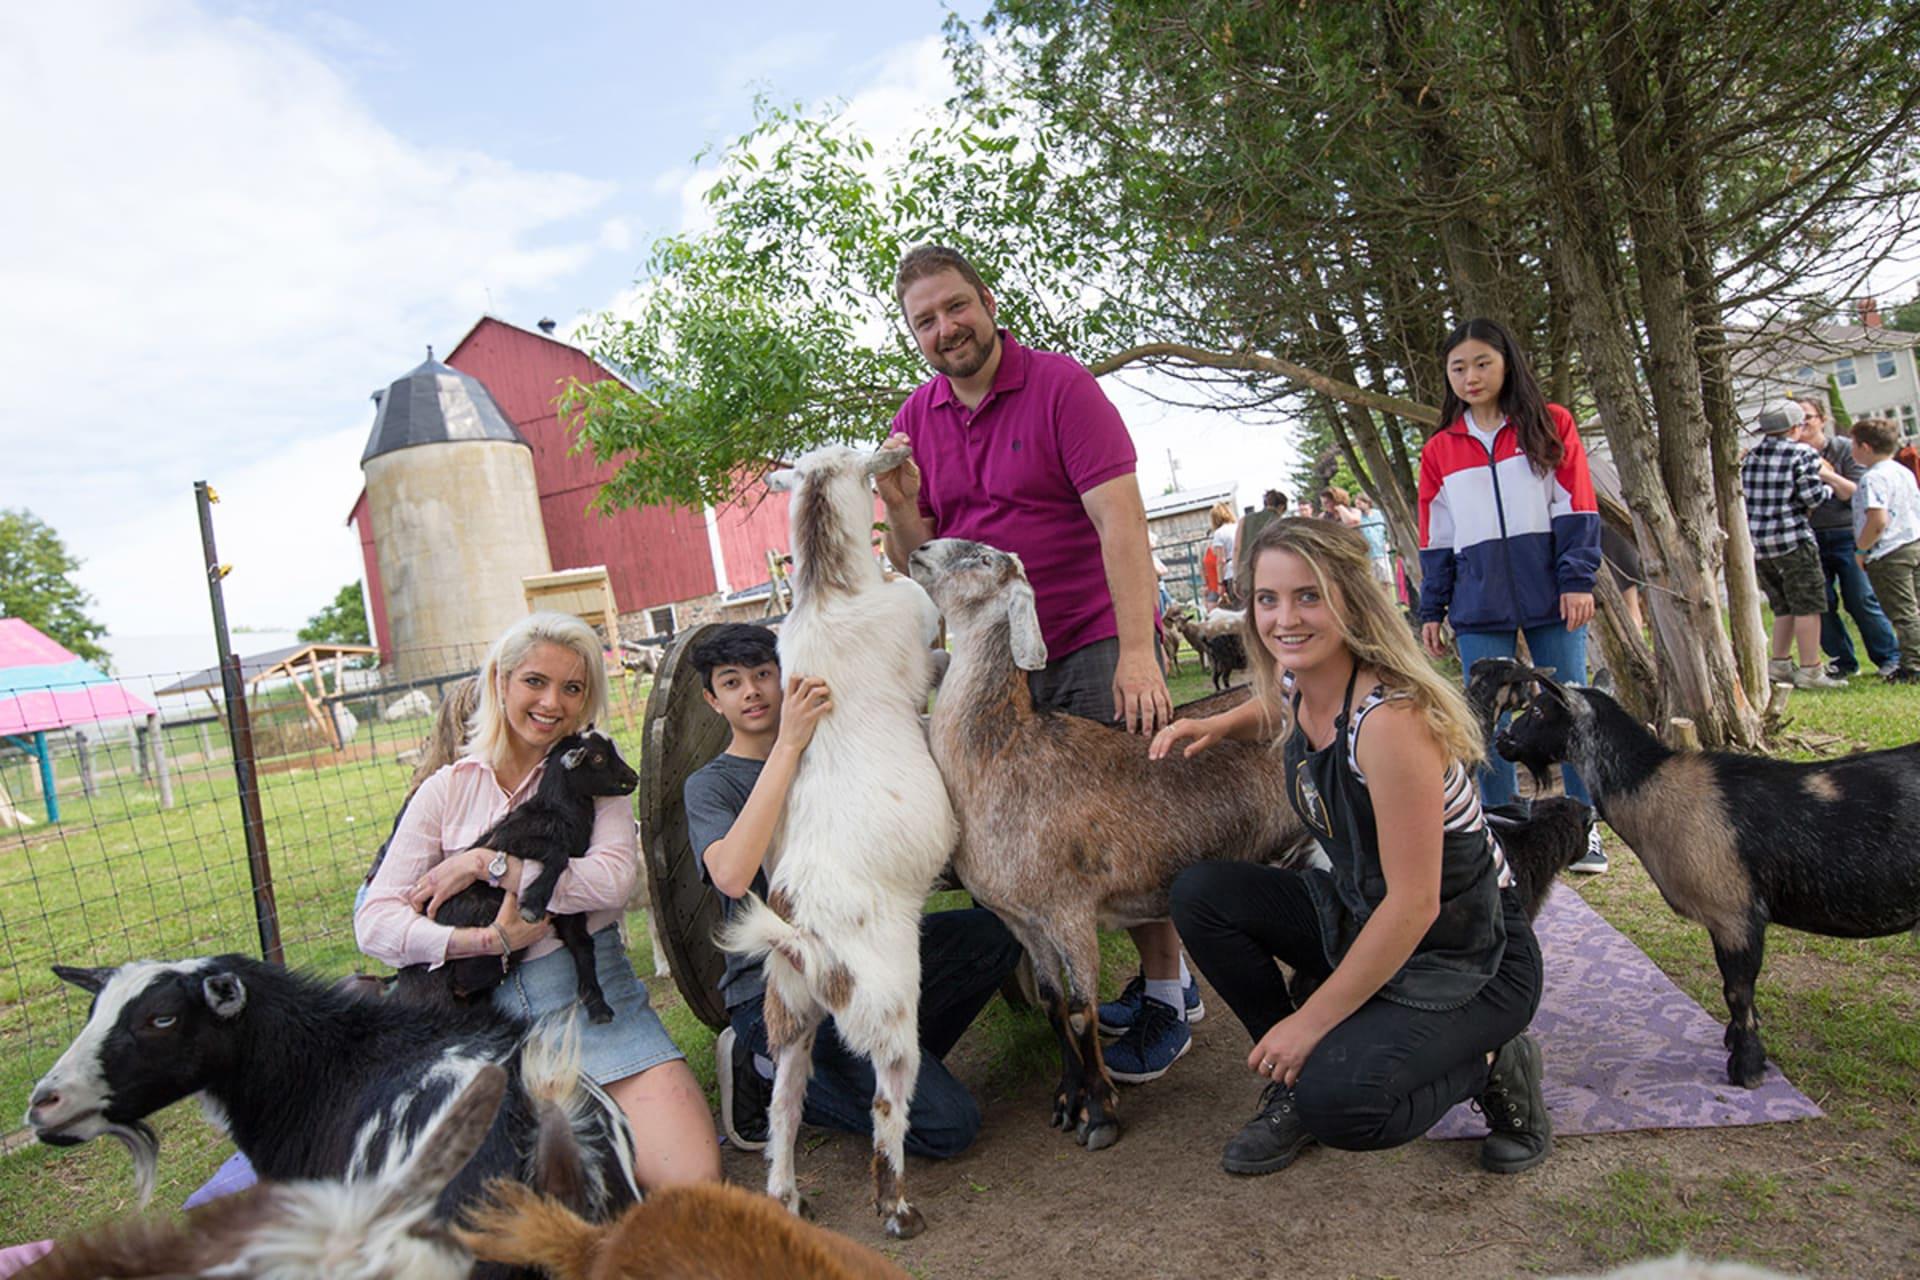 Greater Toronto Area - Goat Shmurgling in Canada